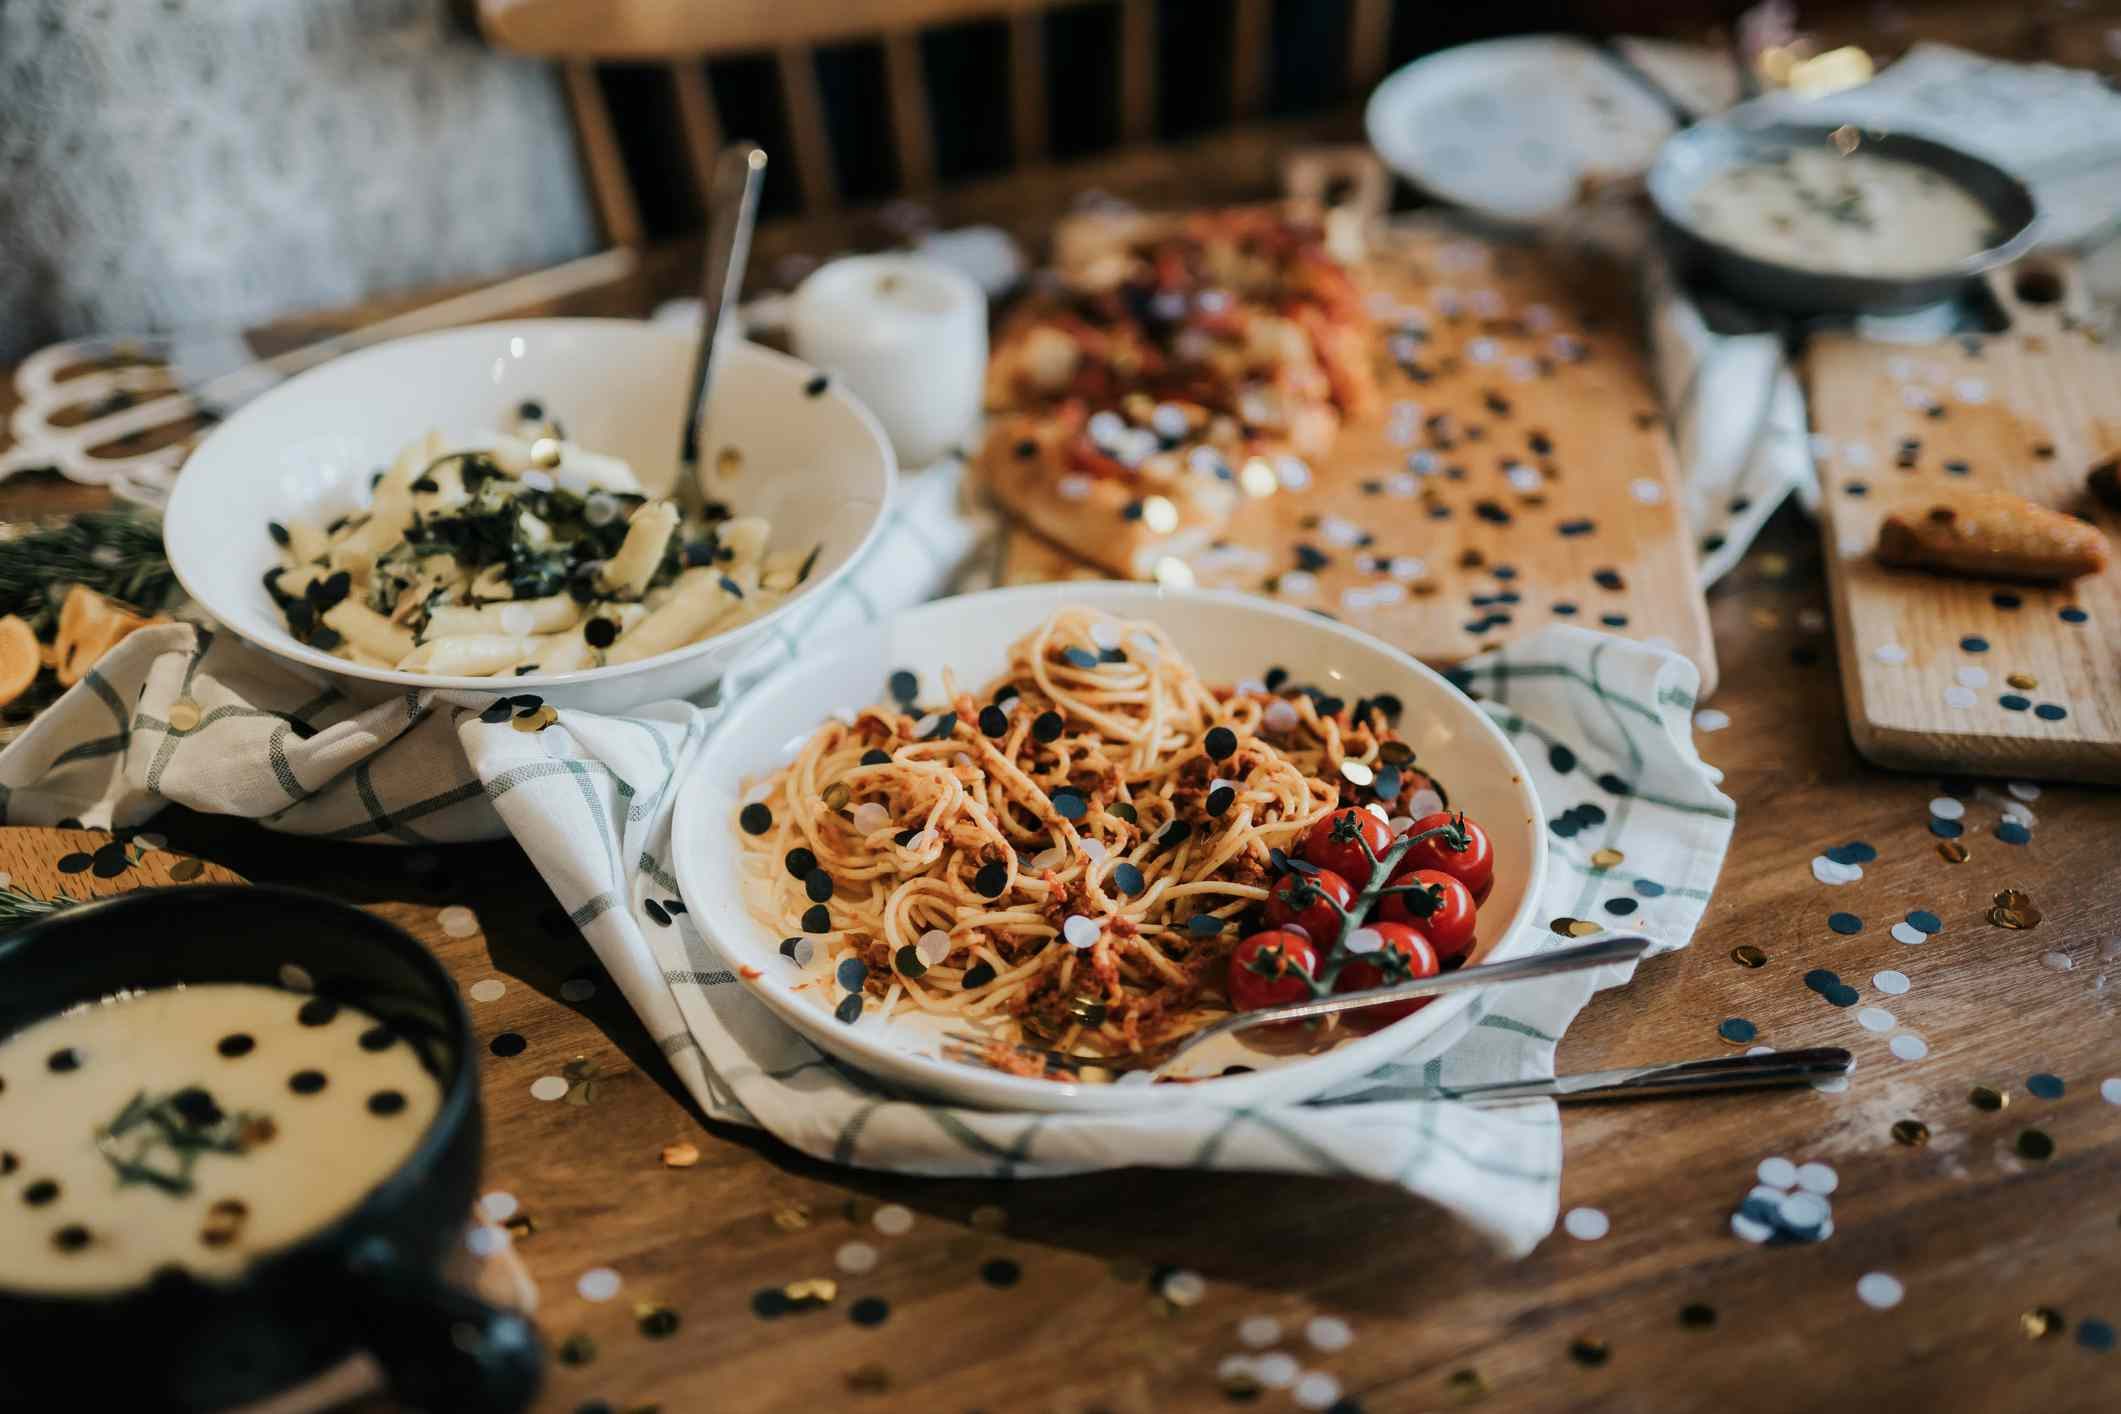 Dinner spread with confetti strewn across table